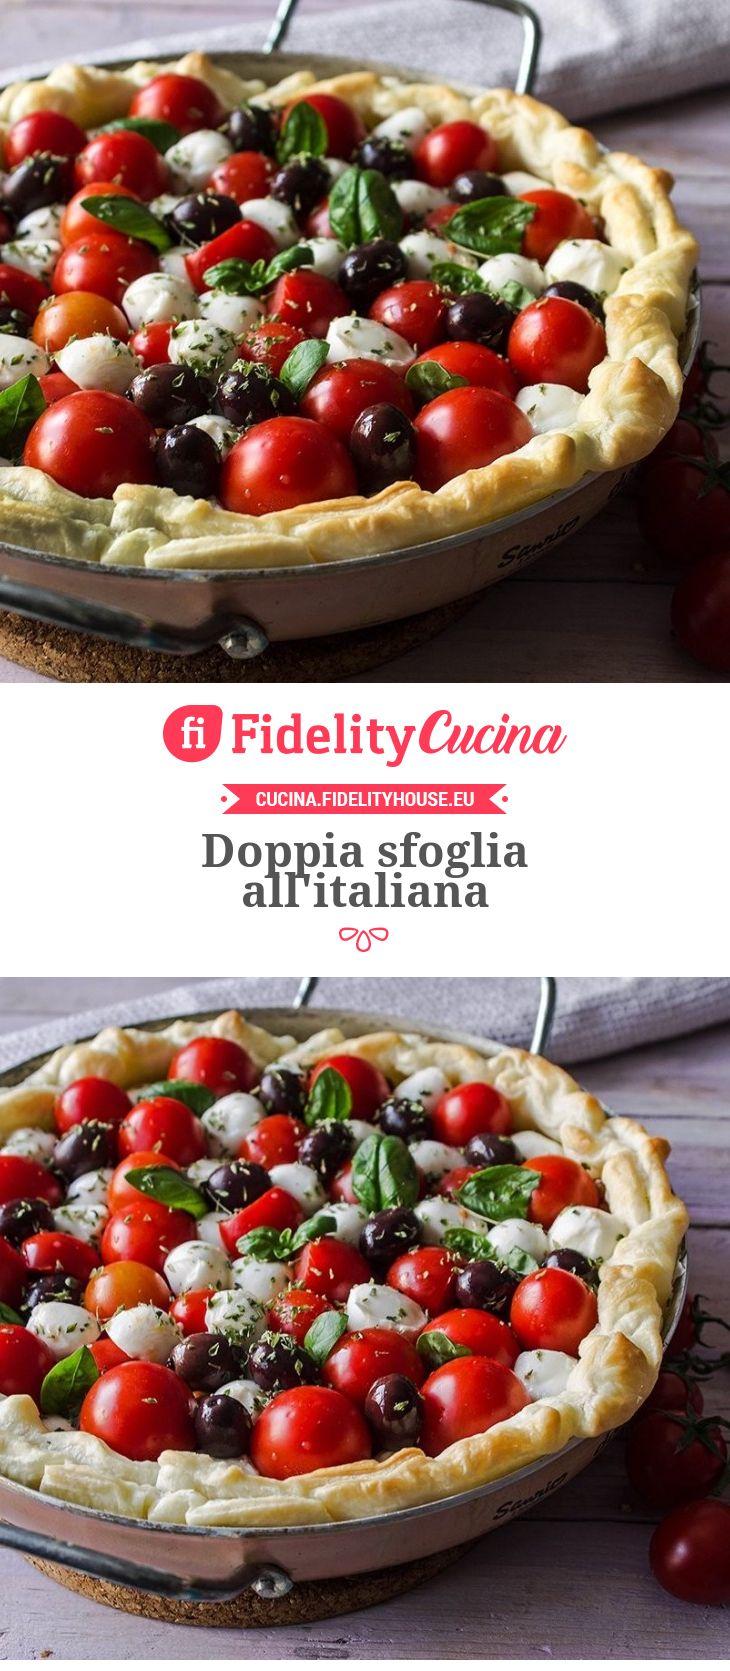 Doppia sfoglia all'italiana